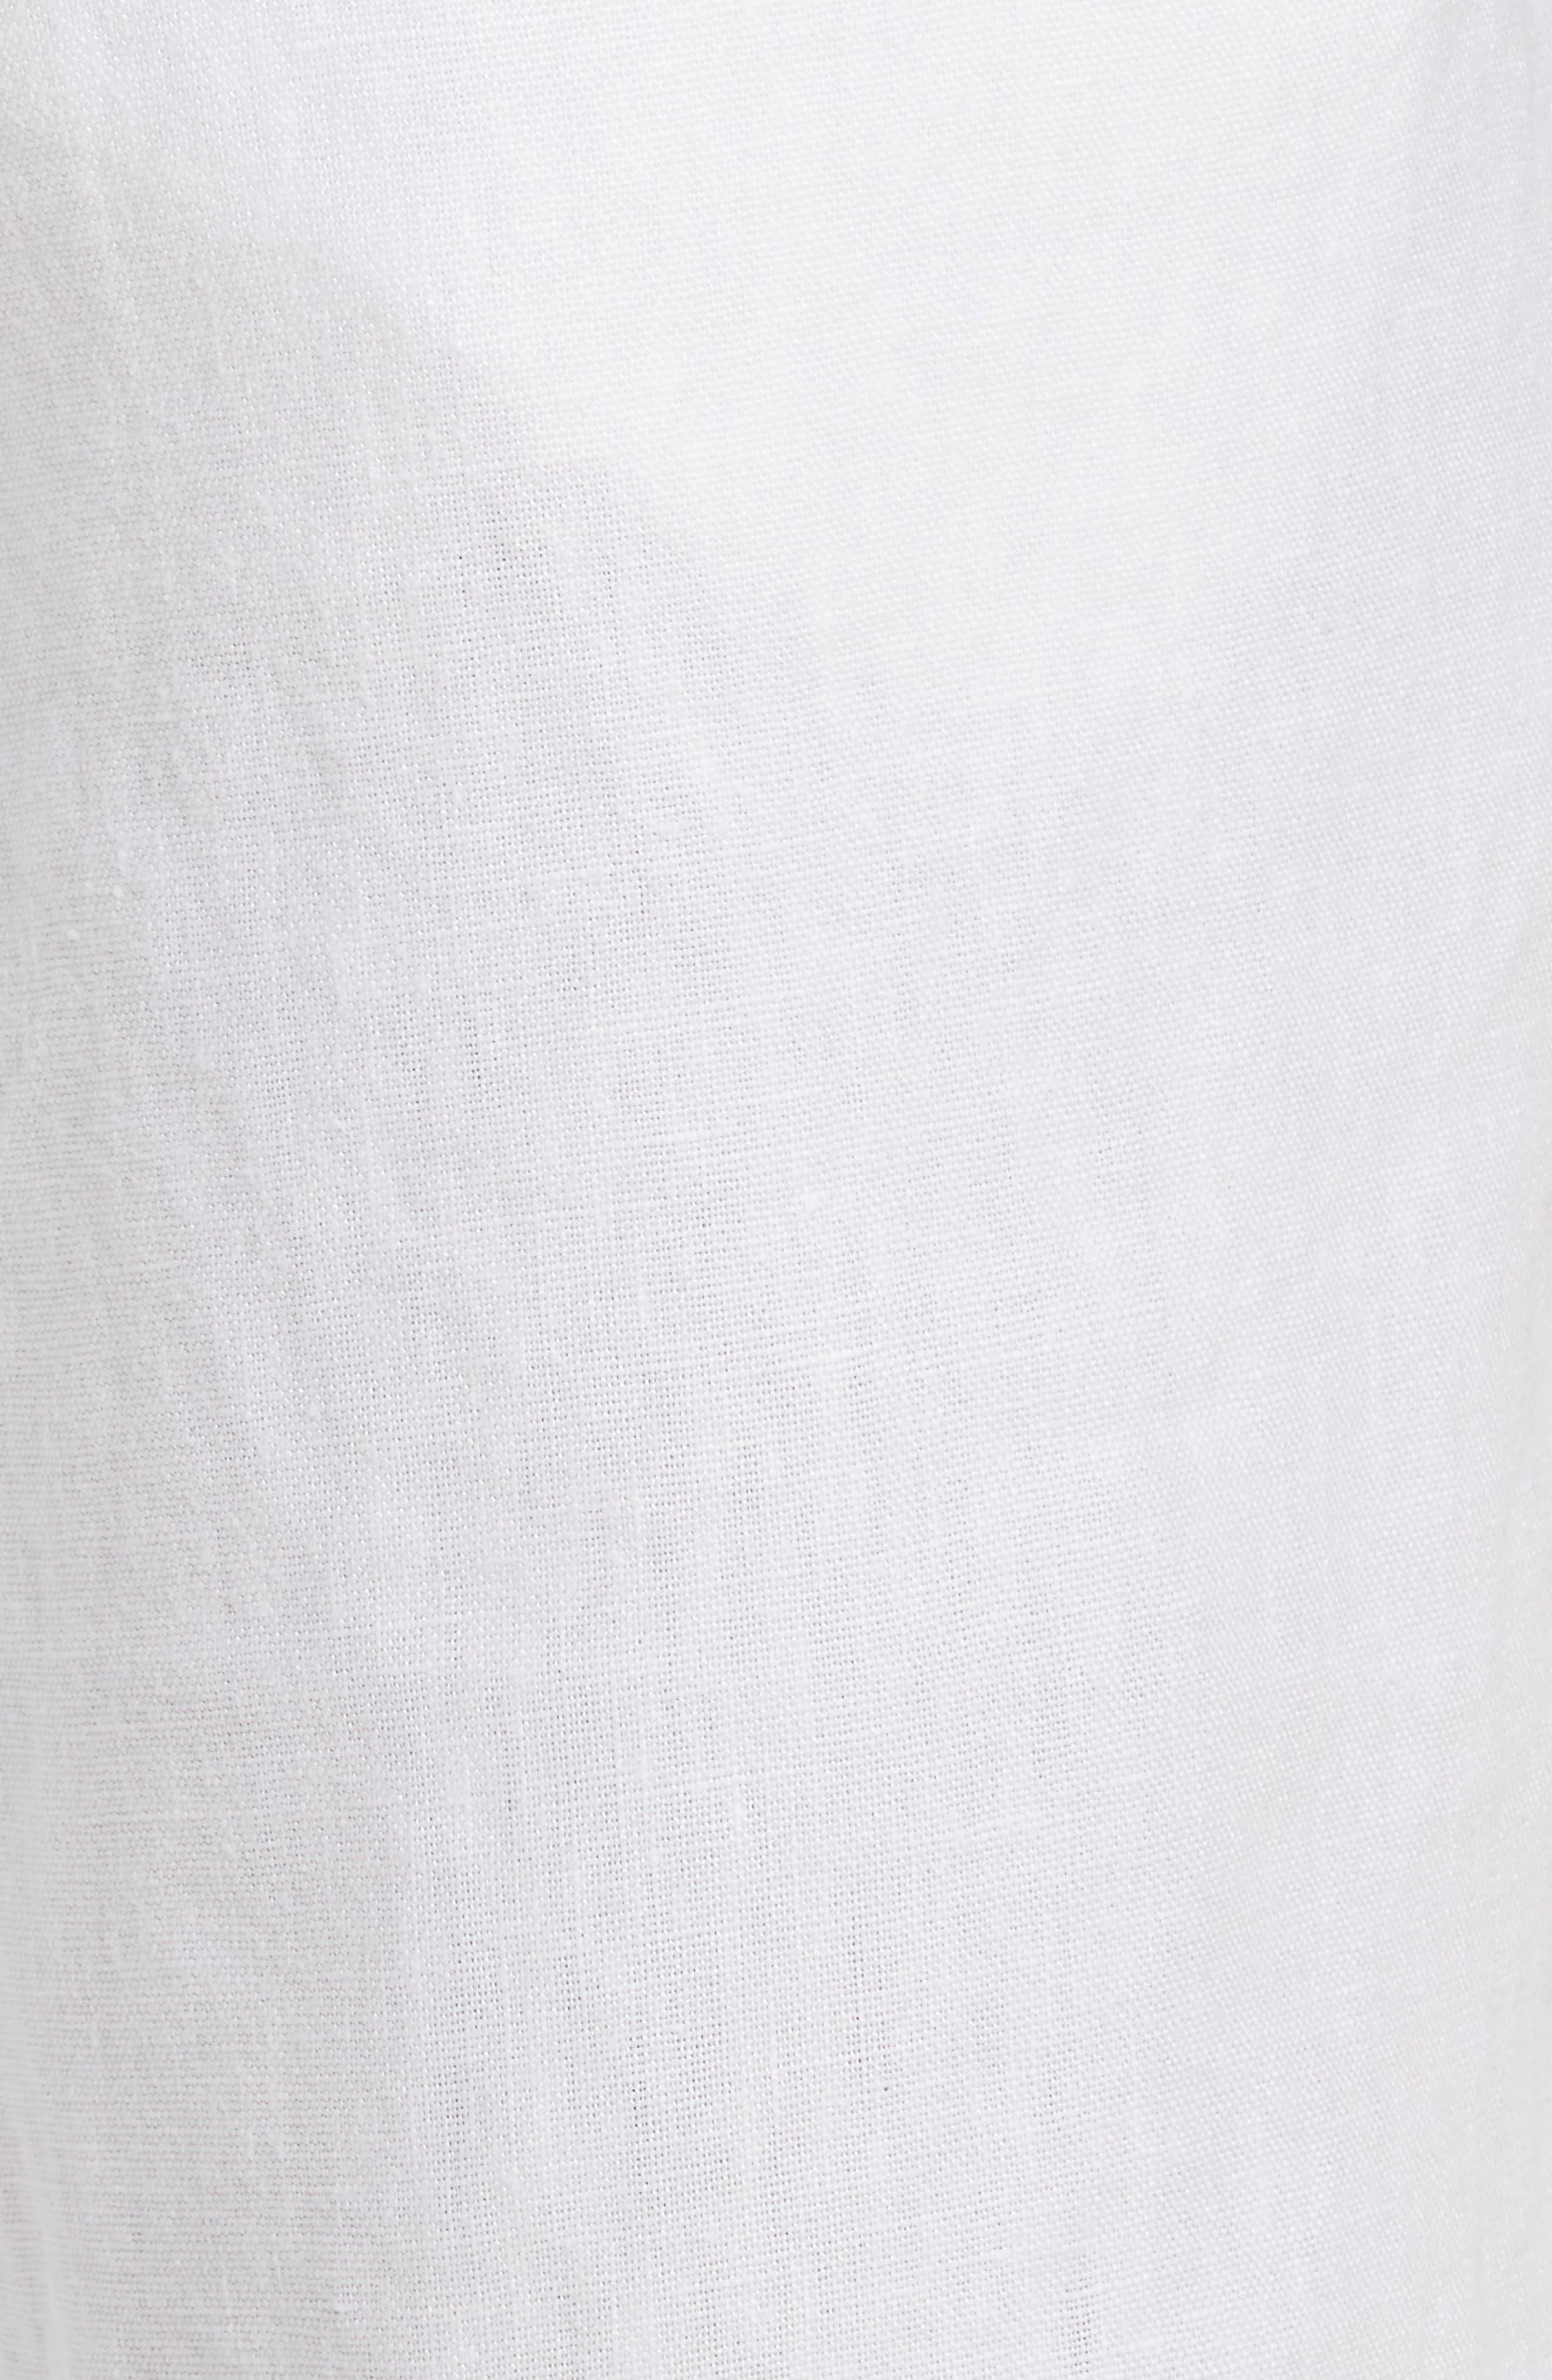 Max Linen Shorts,                             Alternate thumbnail 5, color,                             WHITE